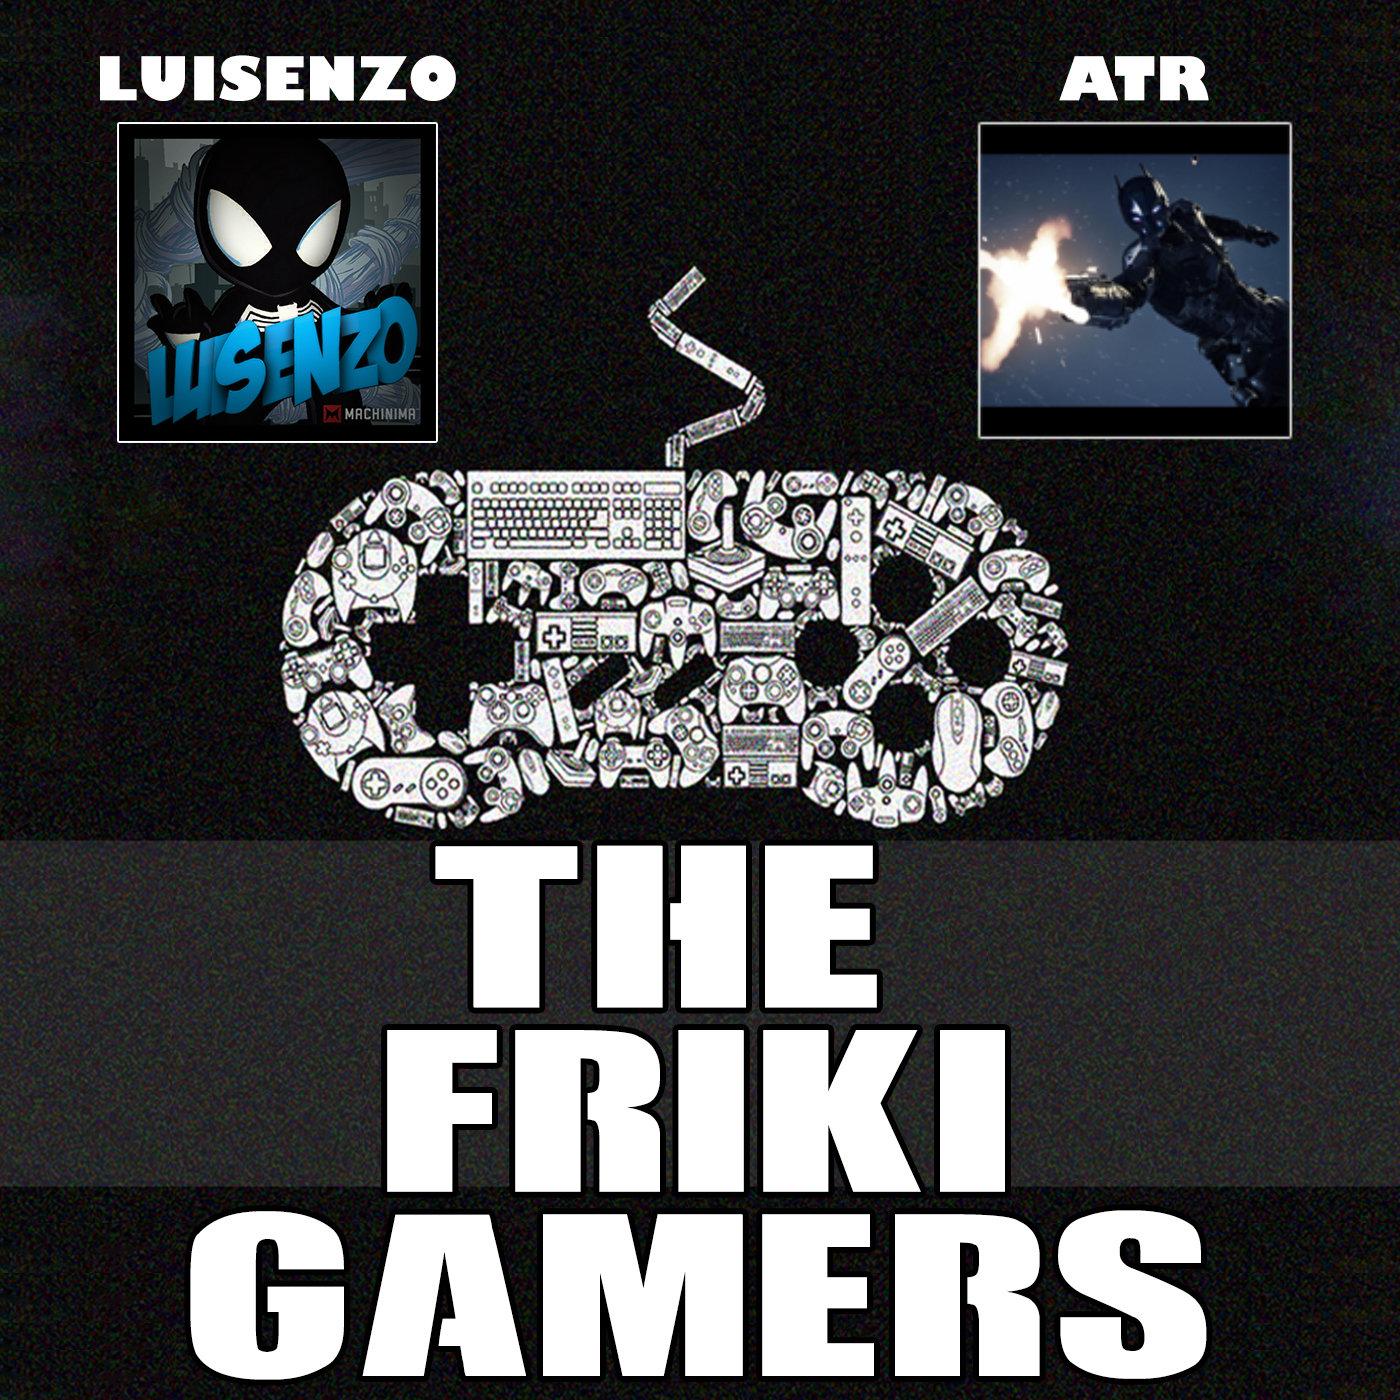 <![CDATA[The Friki Gamers]]>